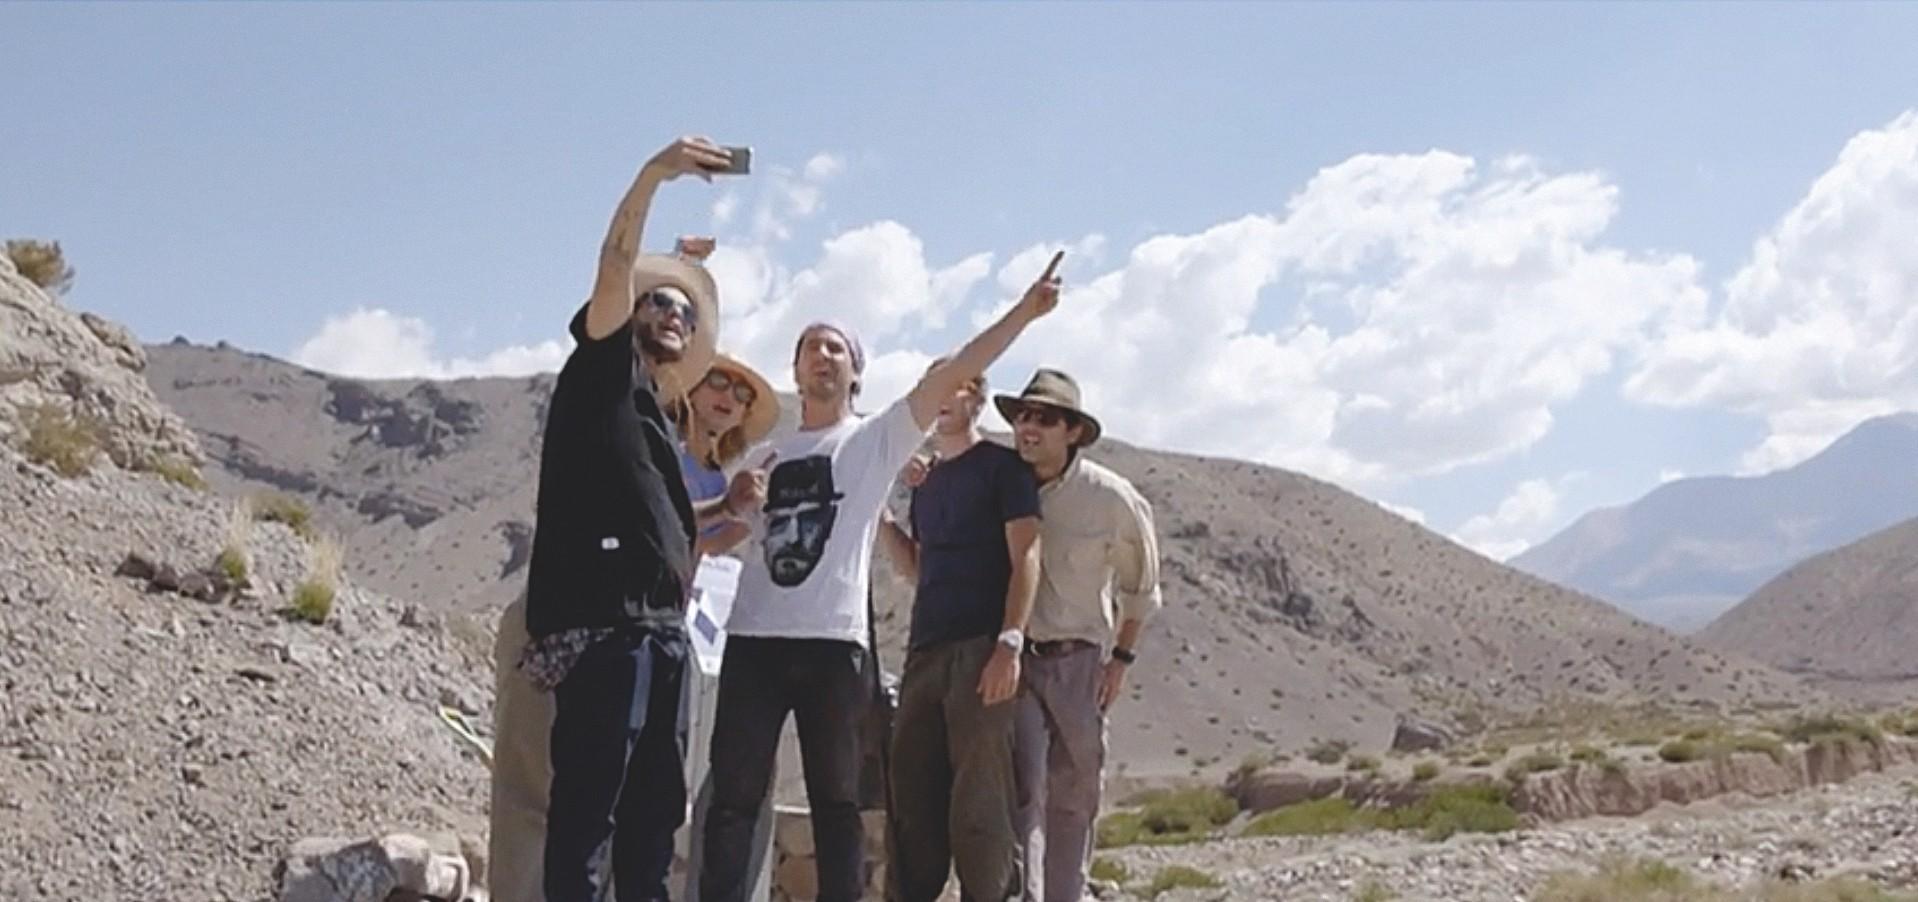 «El cruce de los Andes», TV Pública Argentina, 2017.